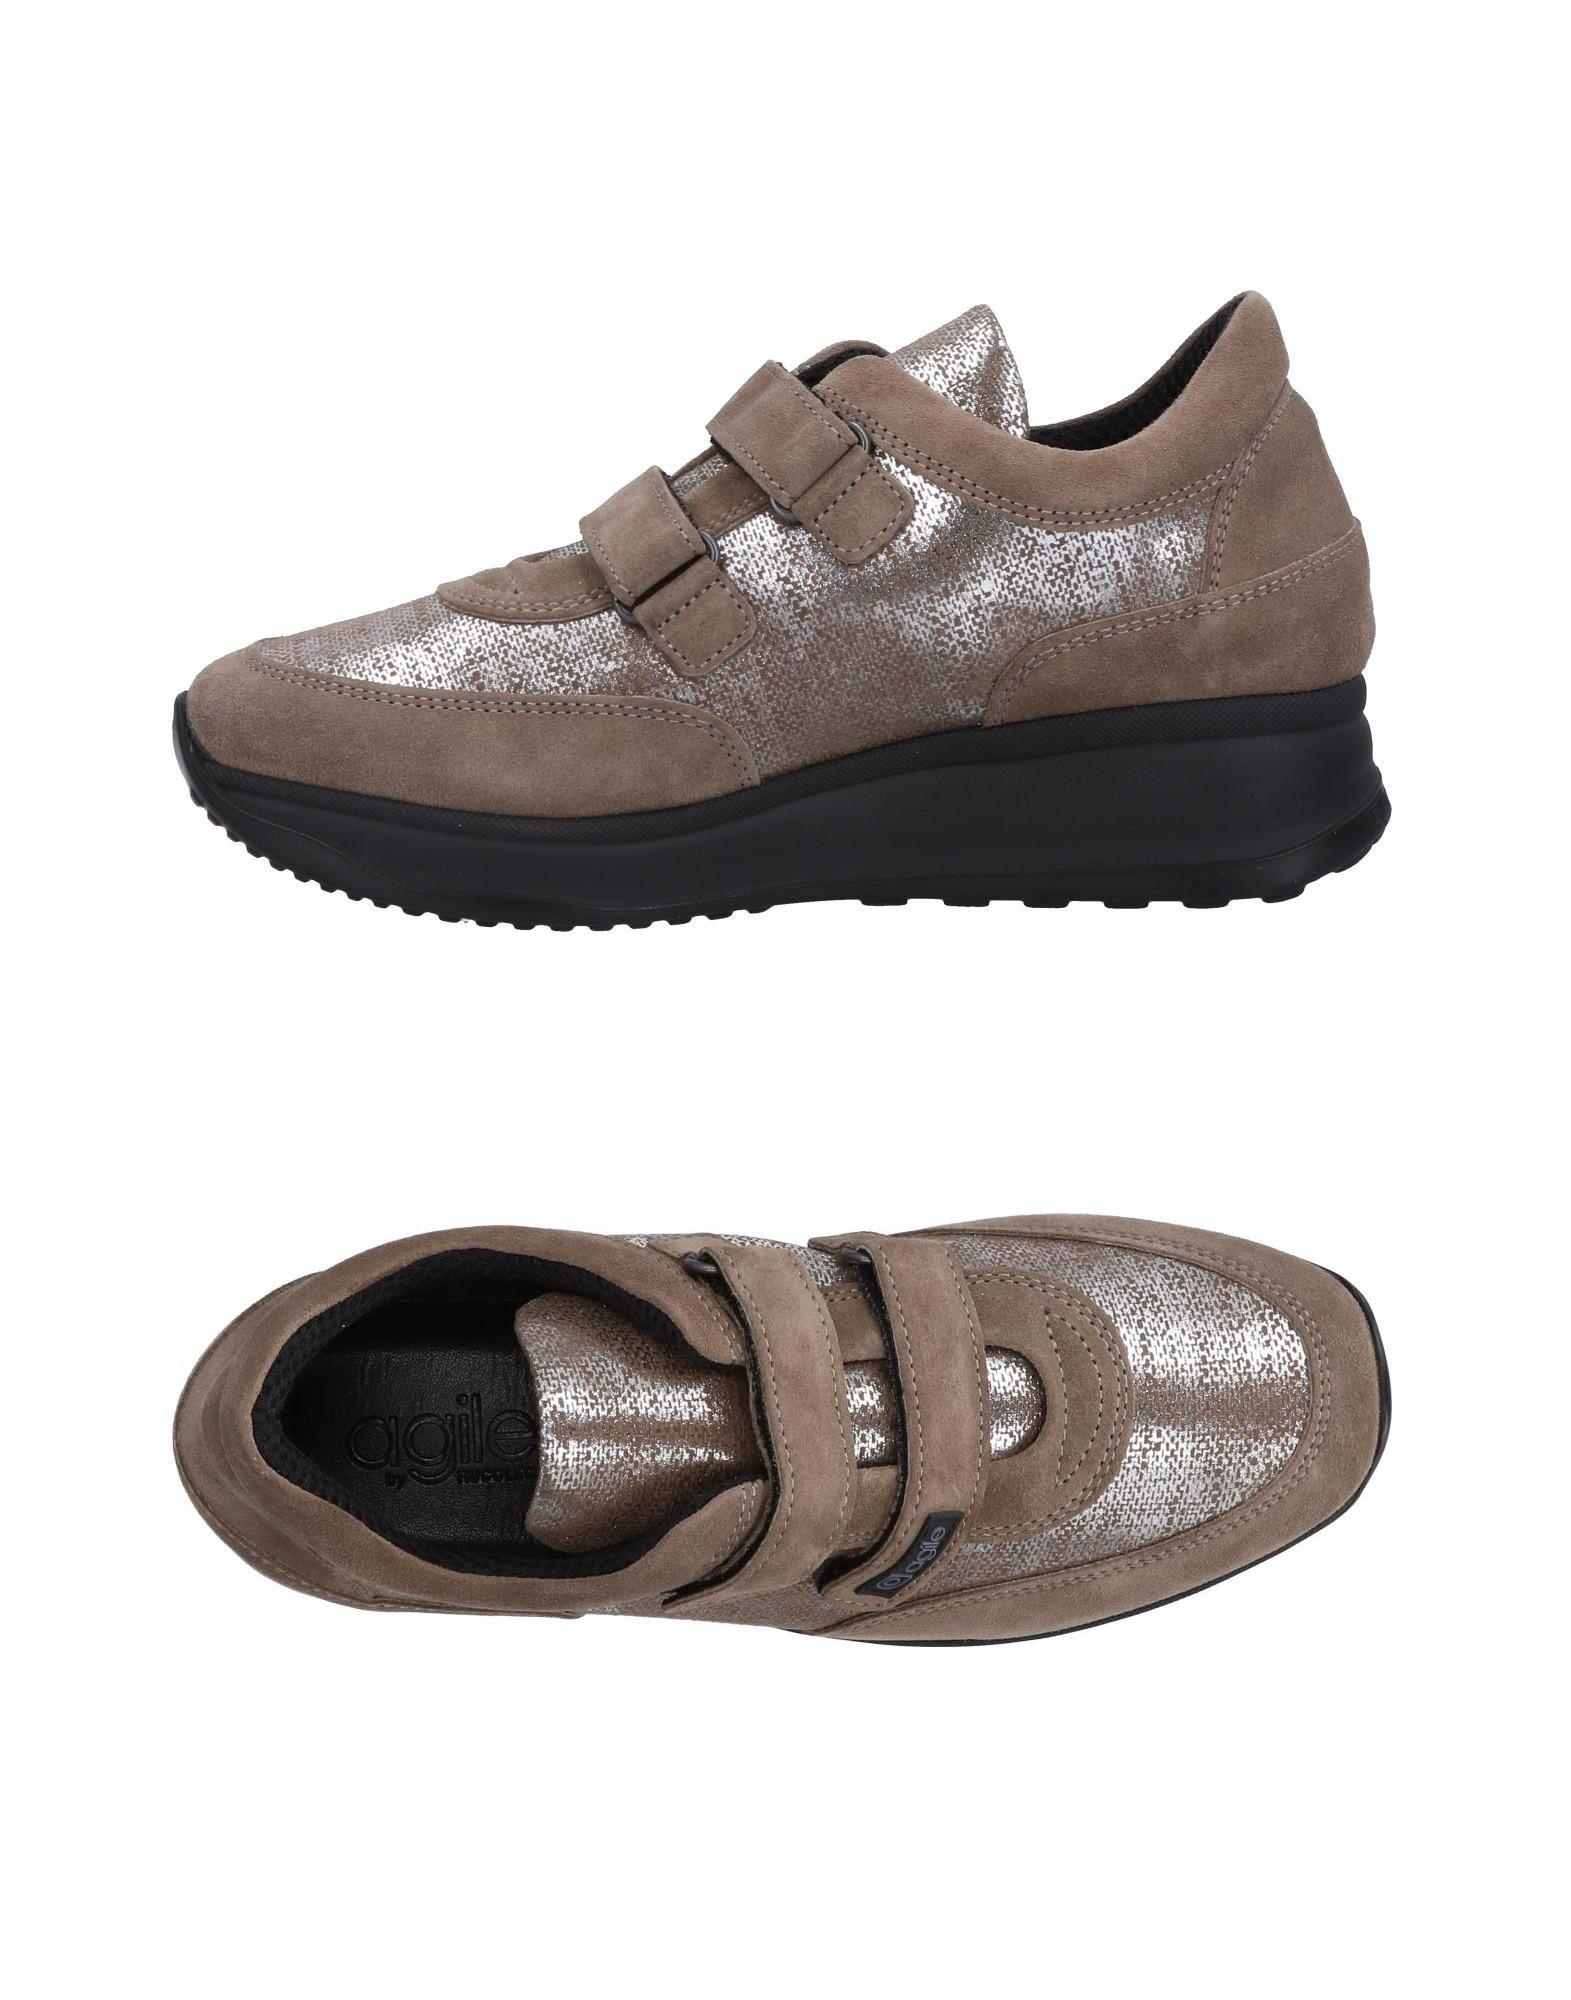 Agile By Rucoline Sneakers Damen  11496551BO Gute Qualität beliebte Schuhe